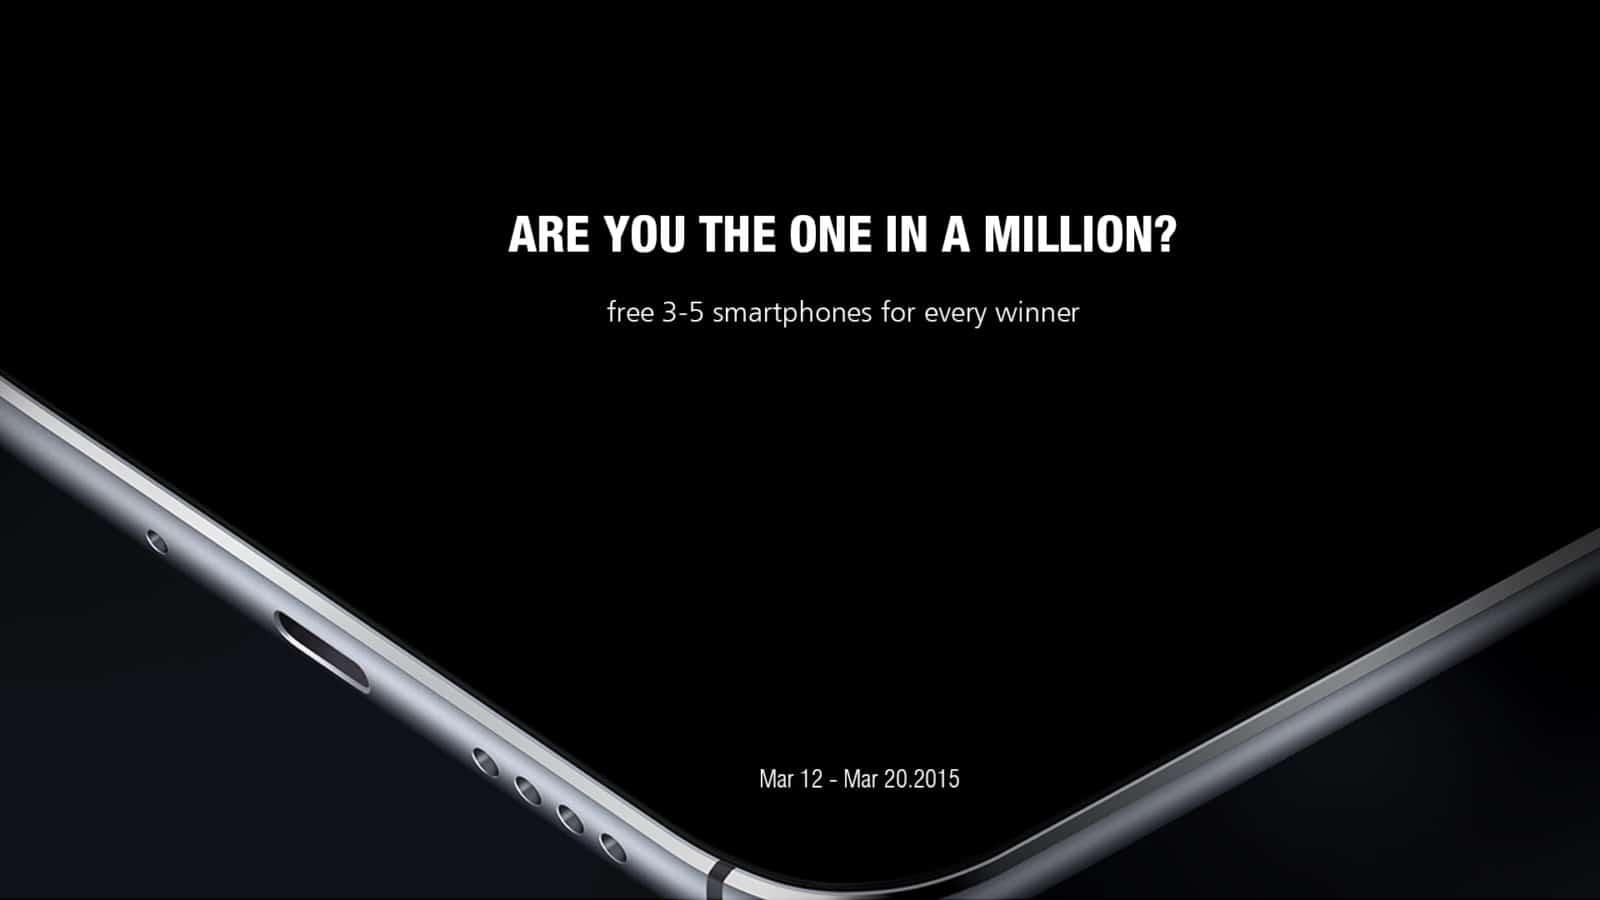 Ulefone March 2015 promotion